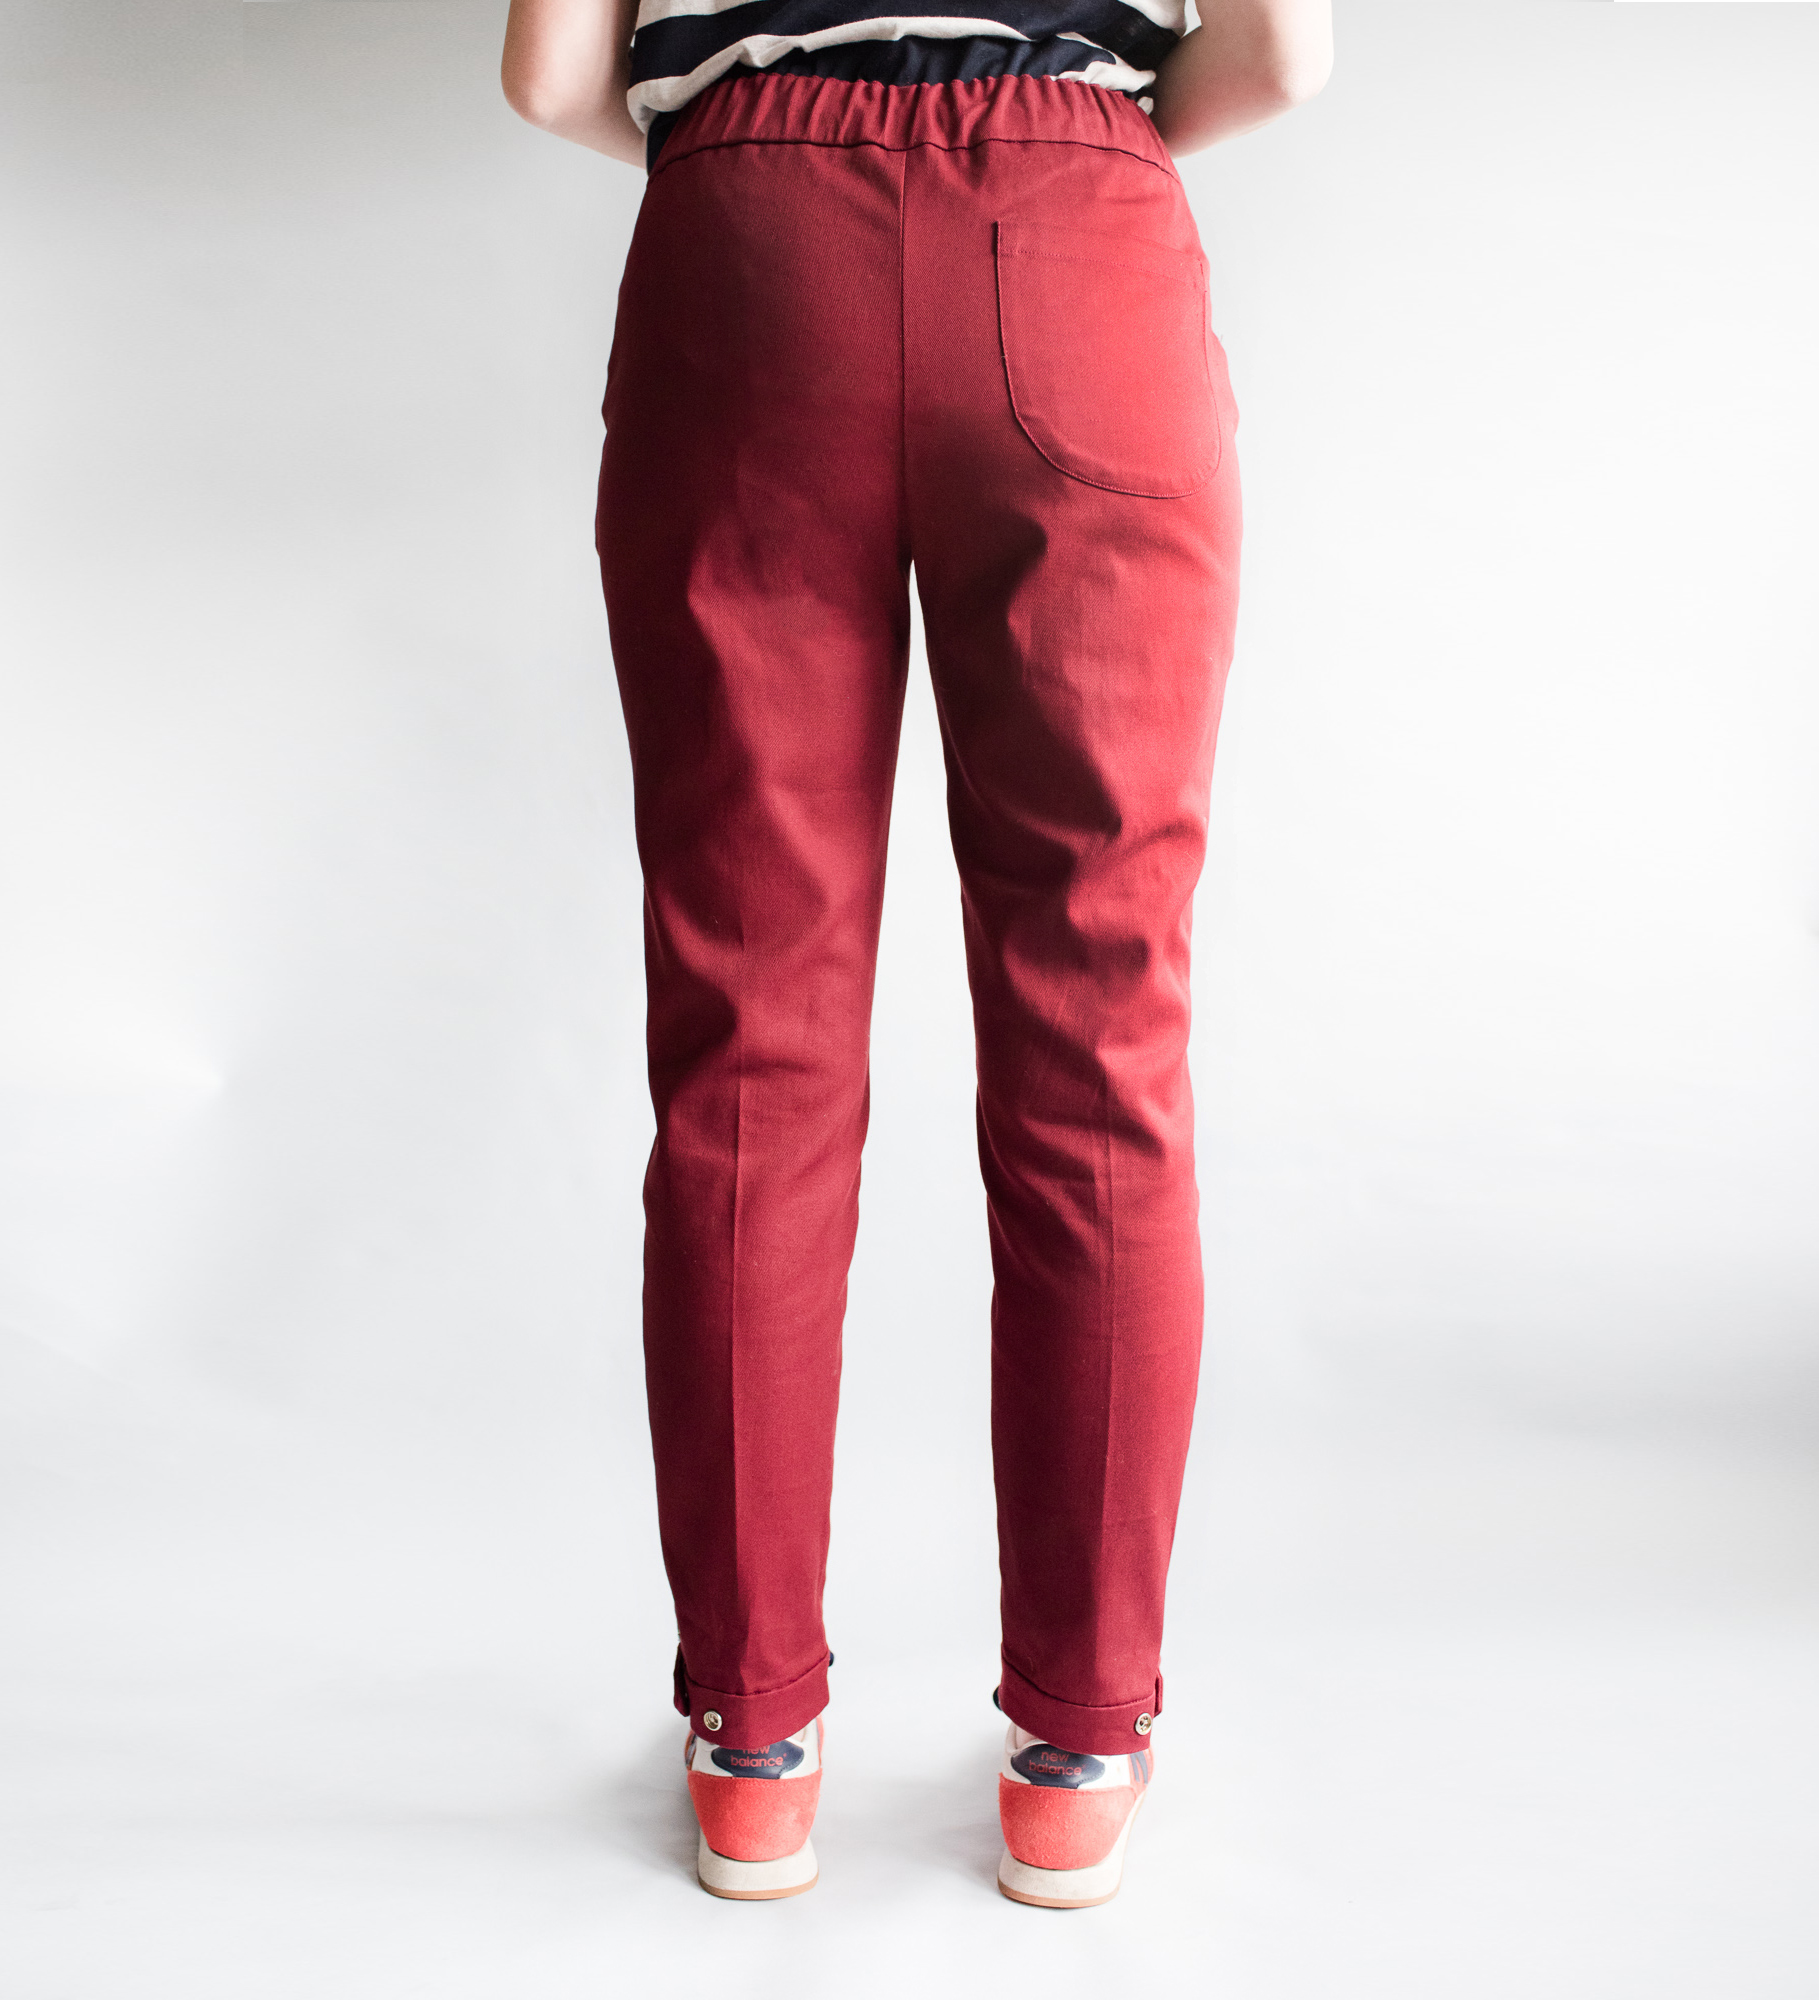 robinson-pdf-sewing-trouser08.jpg